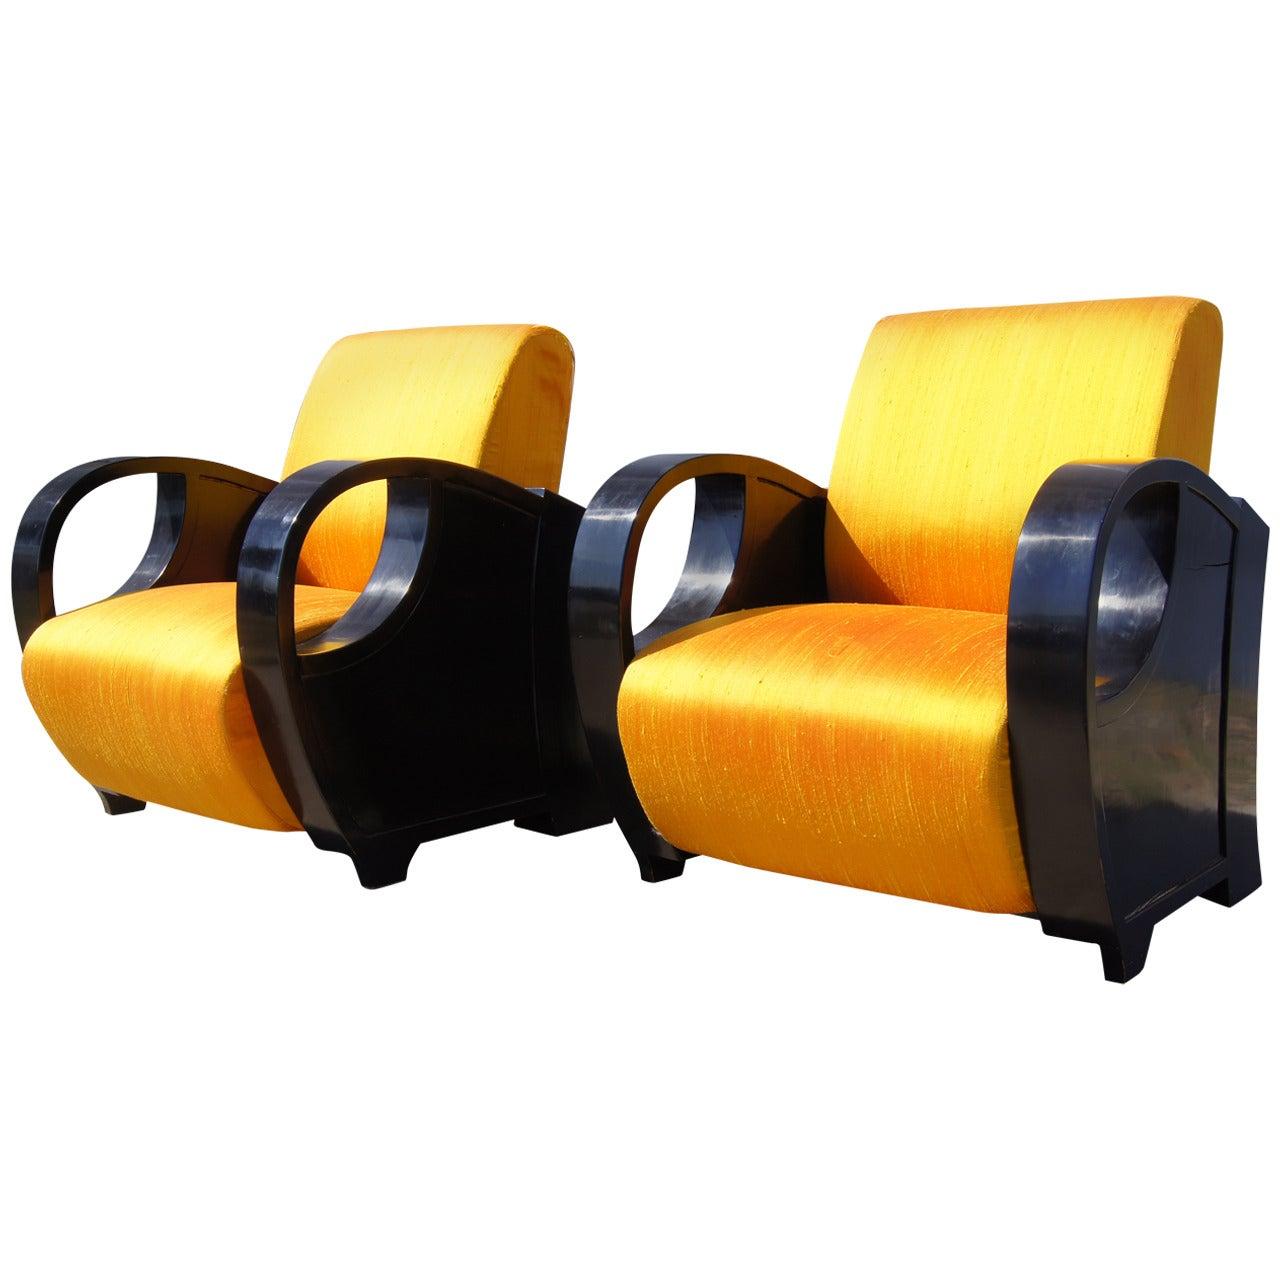 Pair of Ebonized Art Deco Club Chairs, 1930s